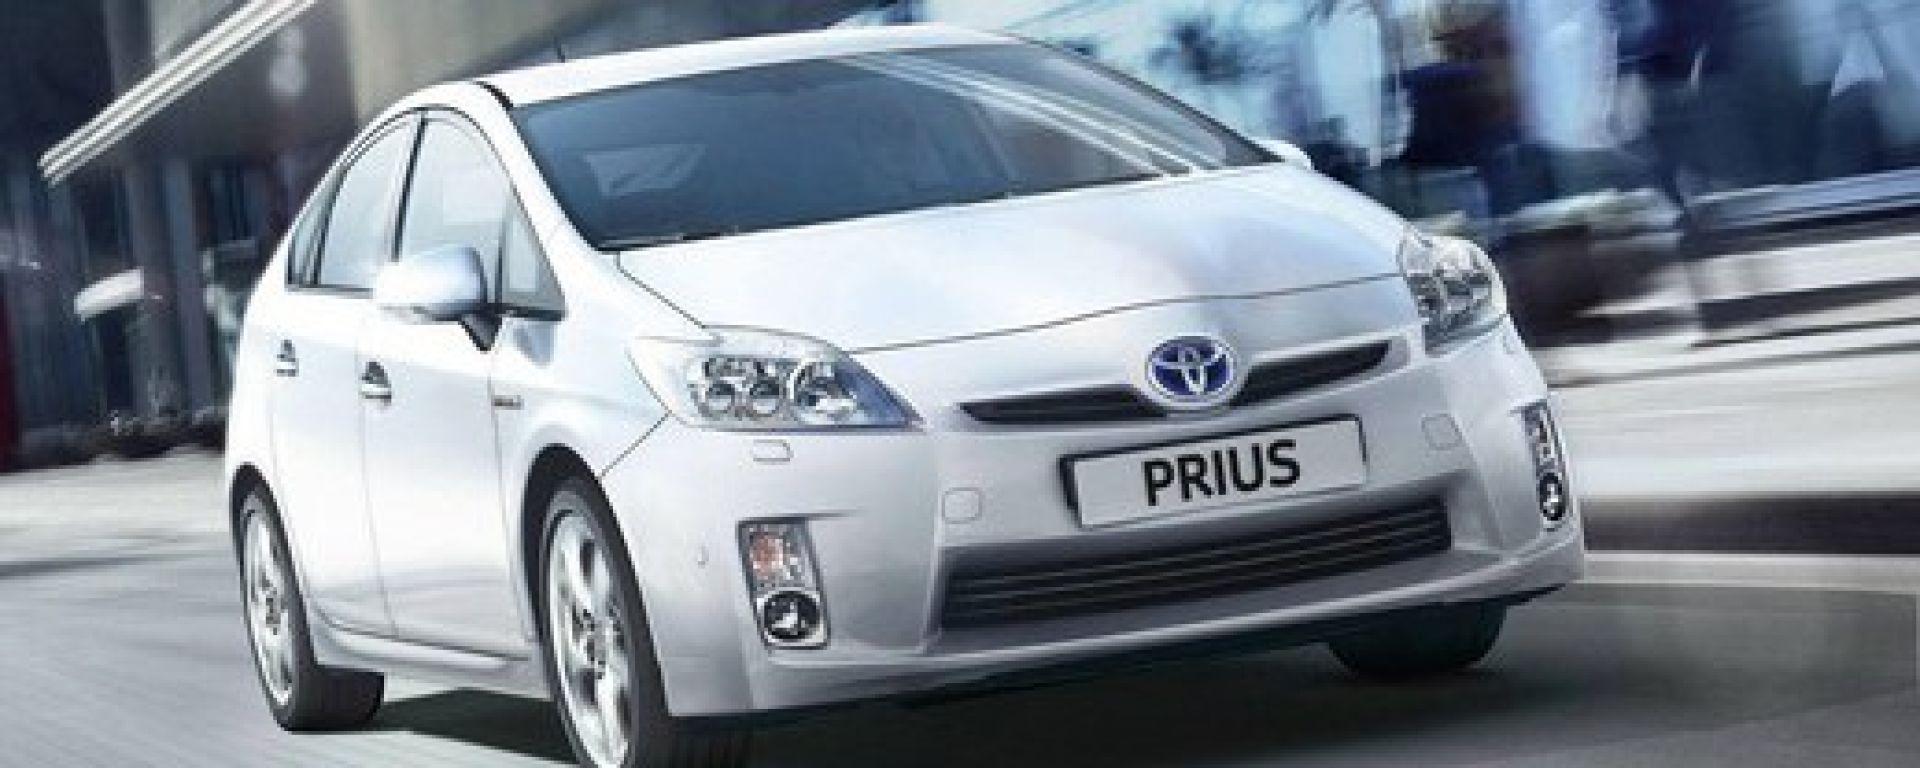 Richiamo Toyota, tutti i modelli interessati